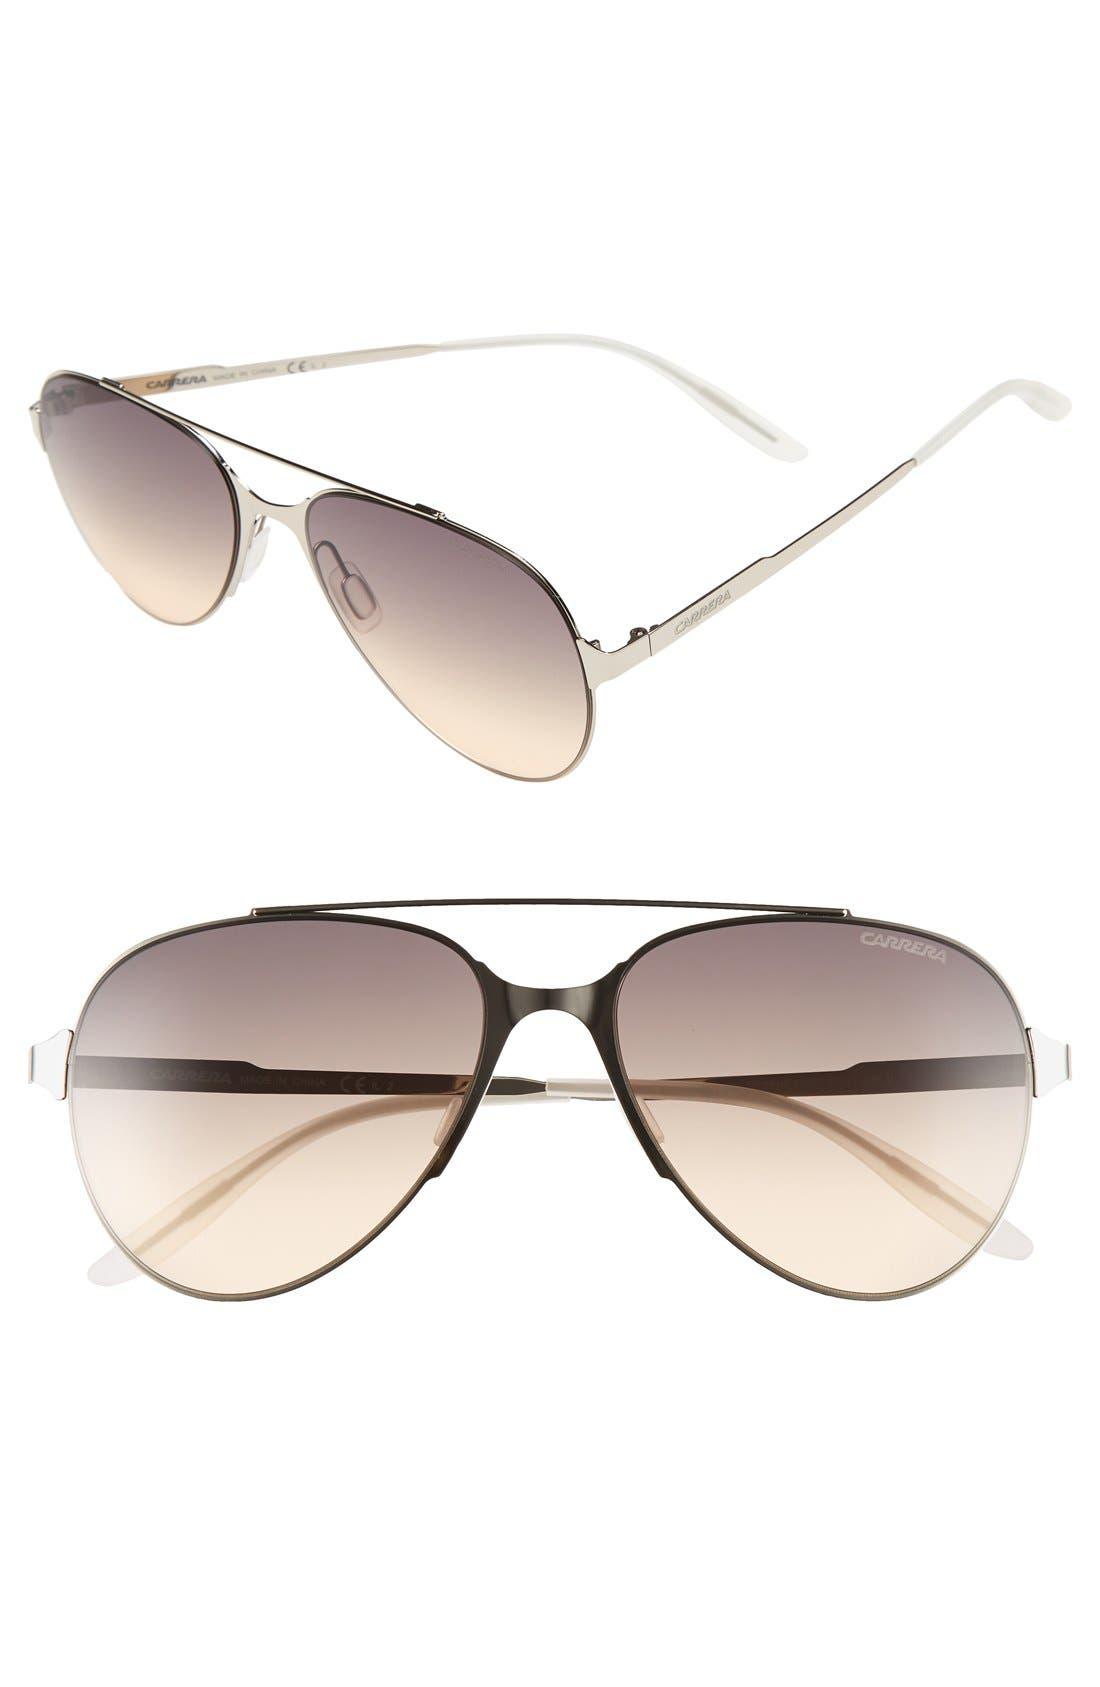 '113/S' Aviator Sunglasses,                             Main thumbnail 1, color,                             Matte Light Gold/ Dark Grey